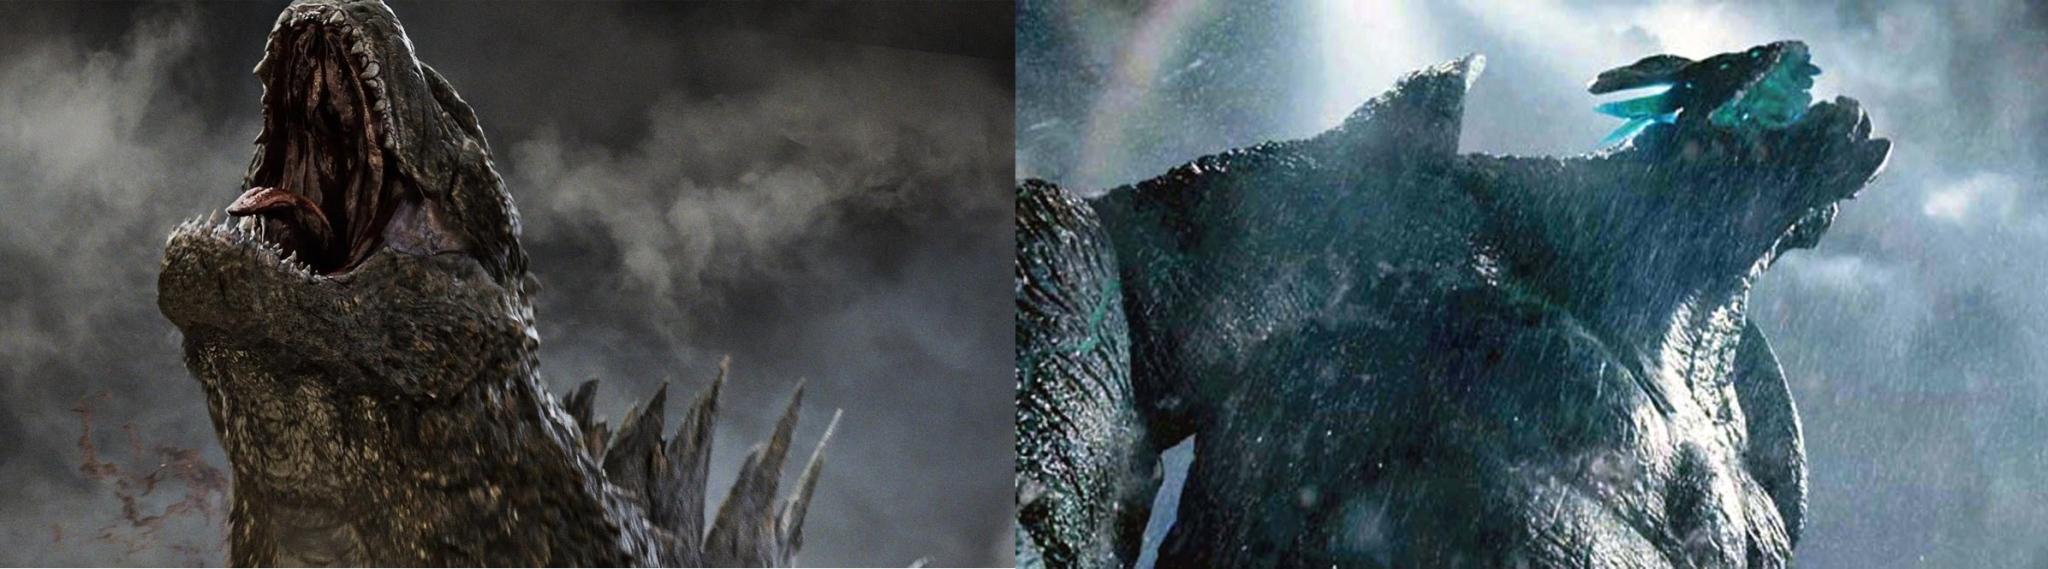 Godzilla-Pacific-Rim